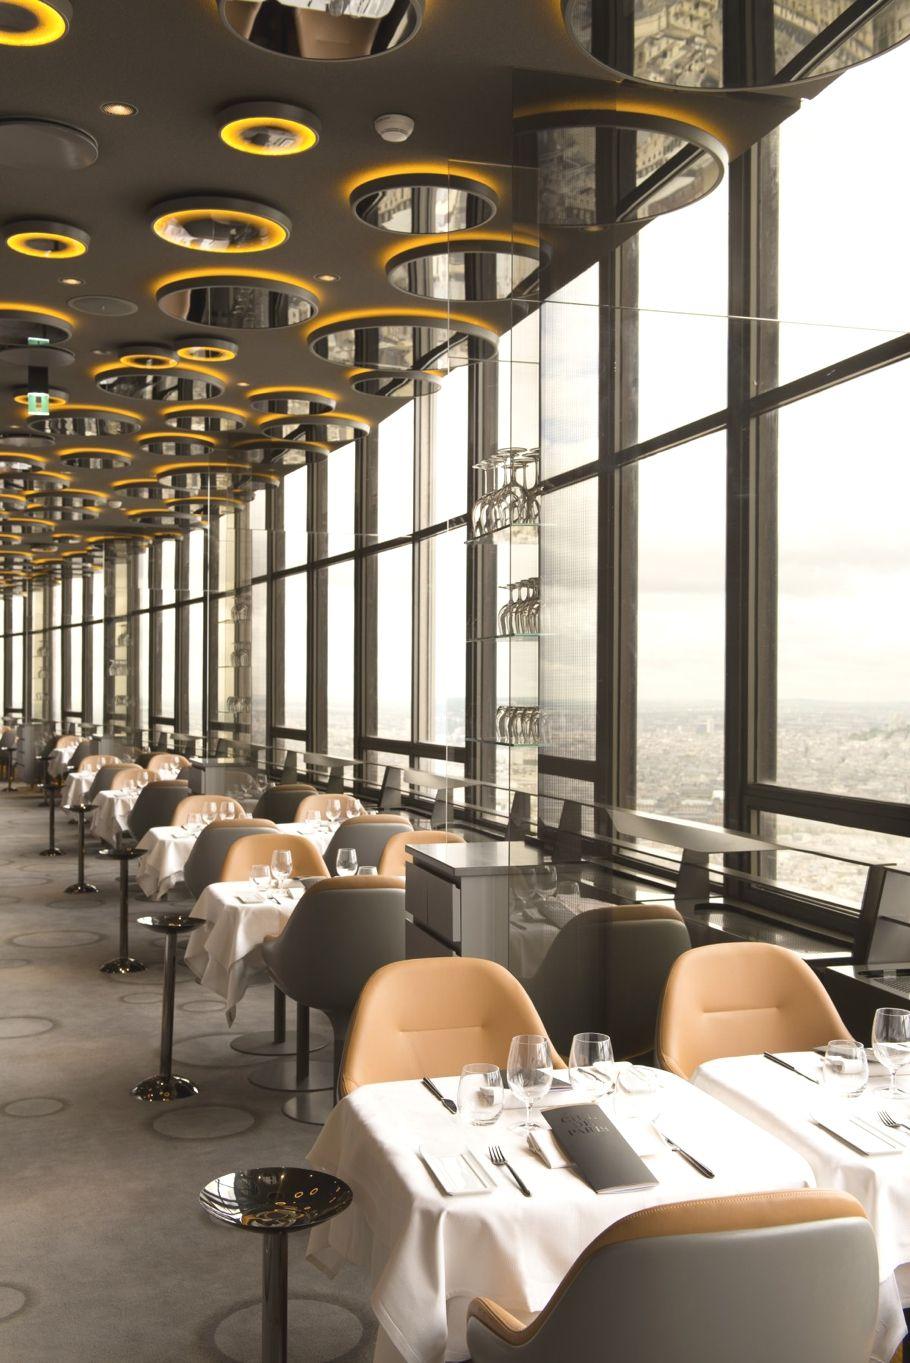 Pin By Maria Glass On Hotels Restaurants Bars Pinterest Paris